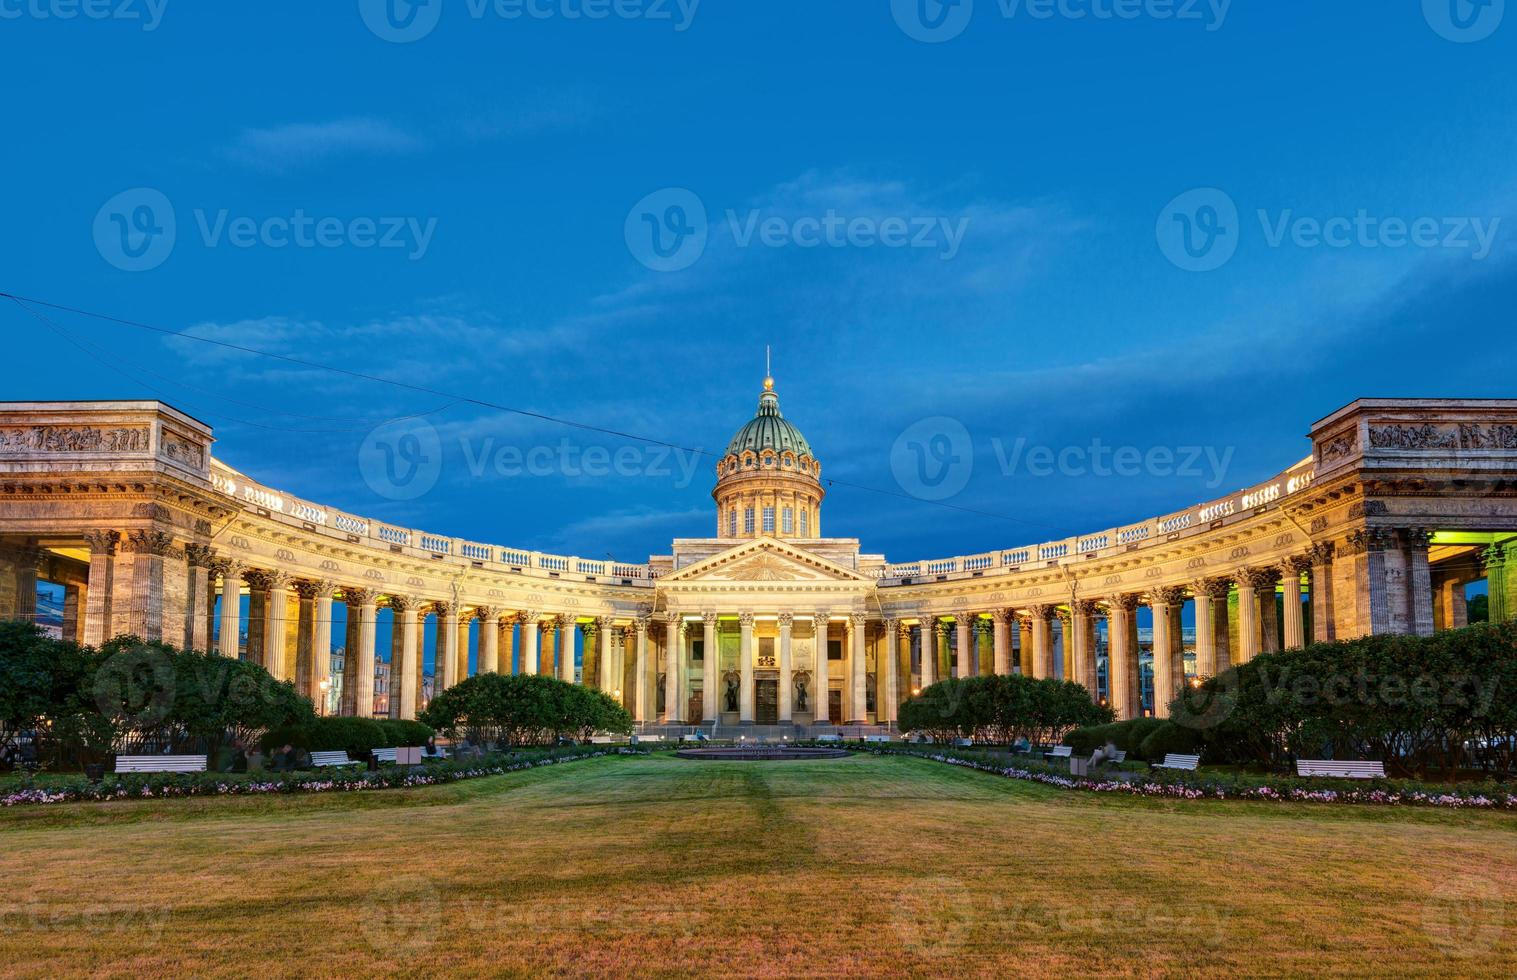 Cattedrale di Kazan a San Pietroburgo, Russia foto